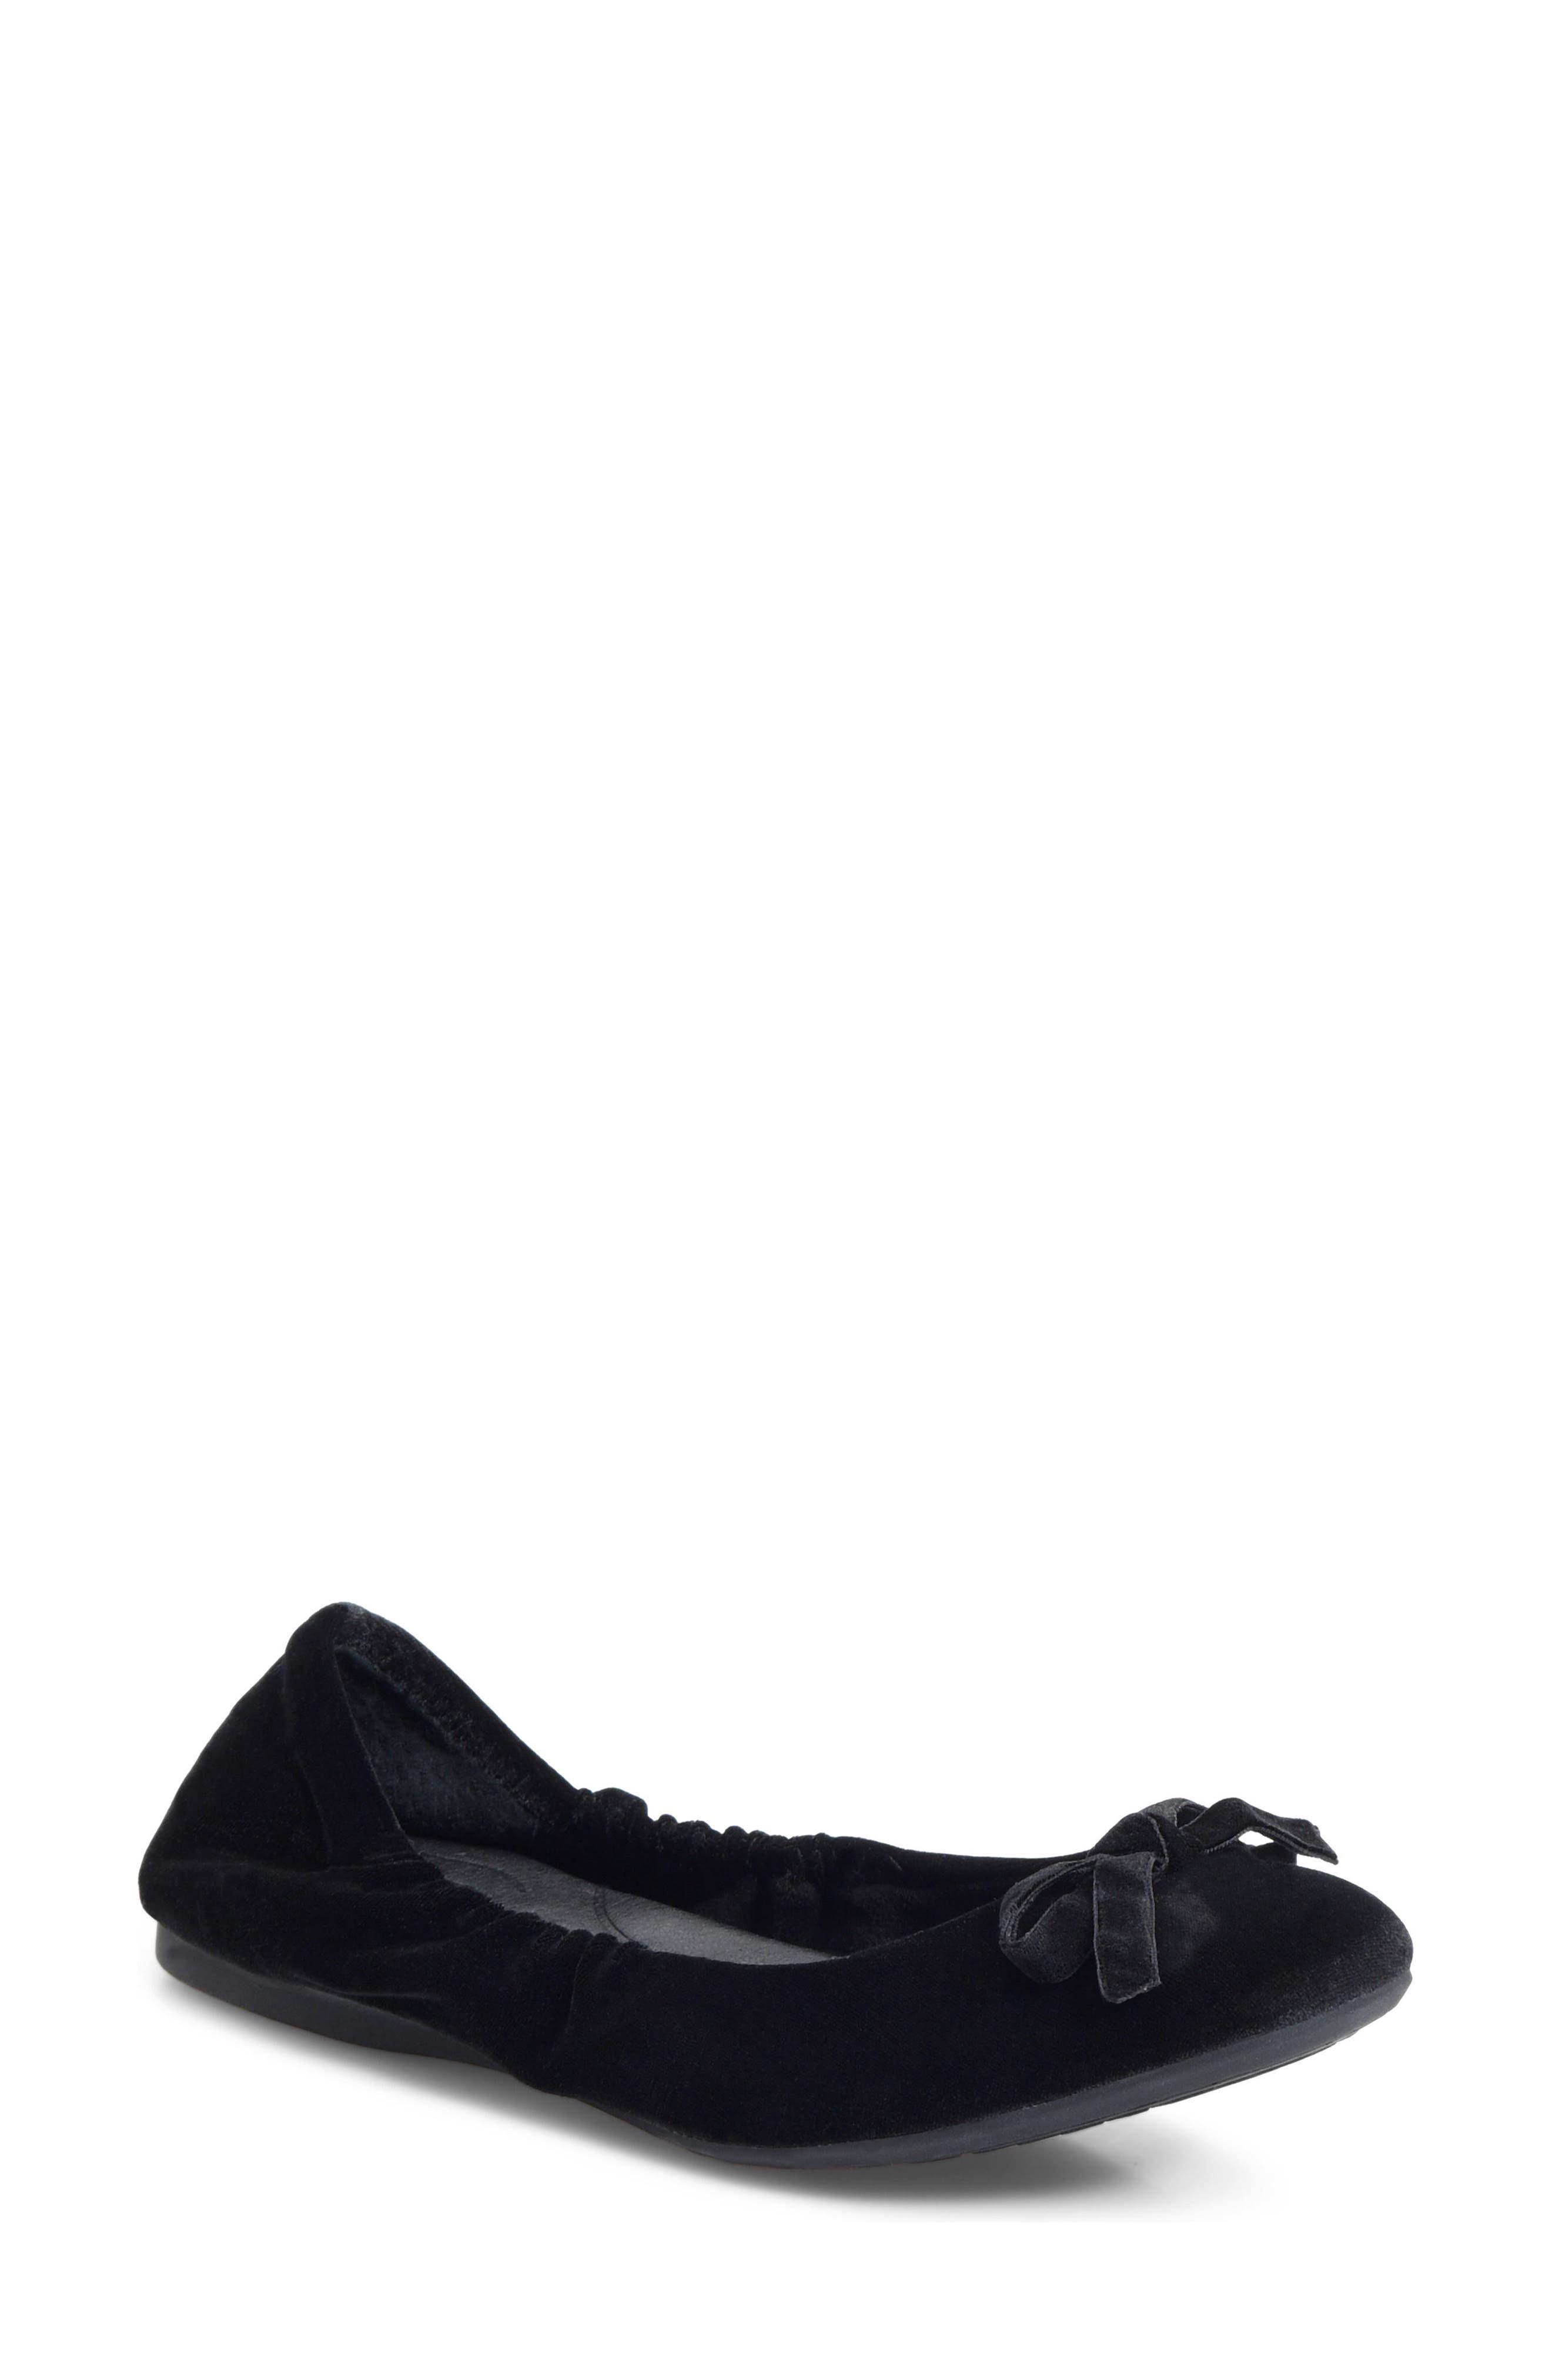 Karoline Ballet Flat,                             Main thumbnail 1, color,                             001